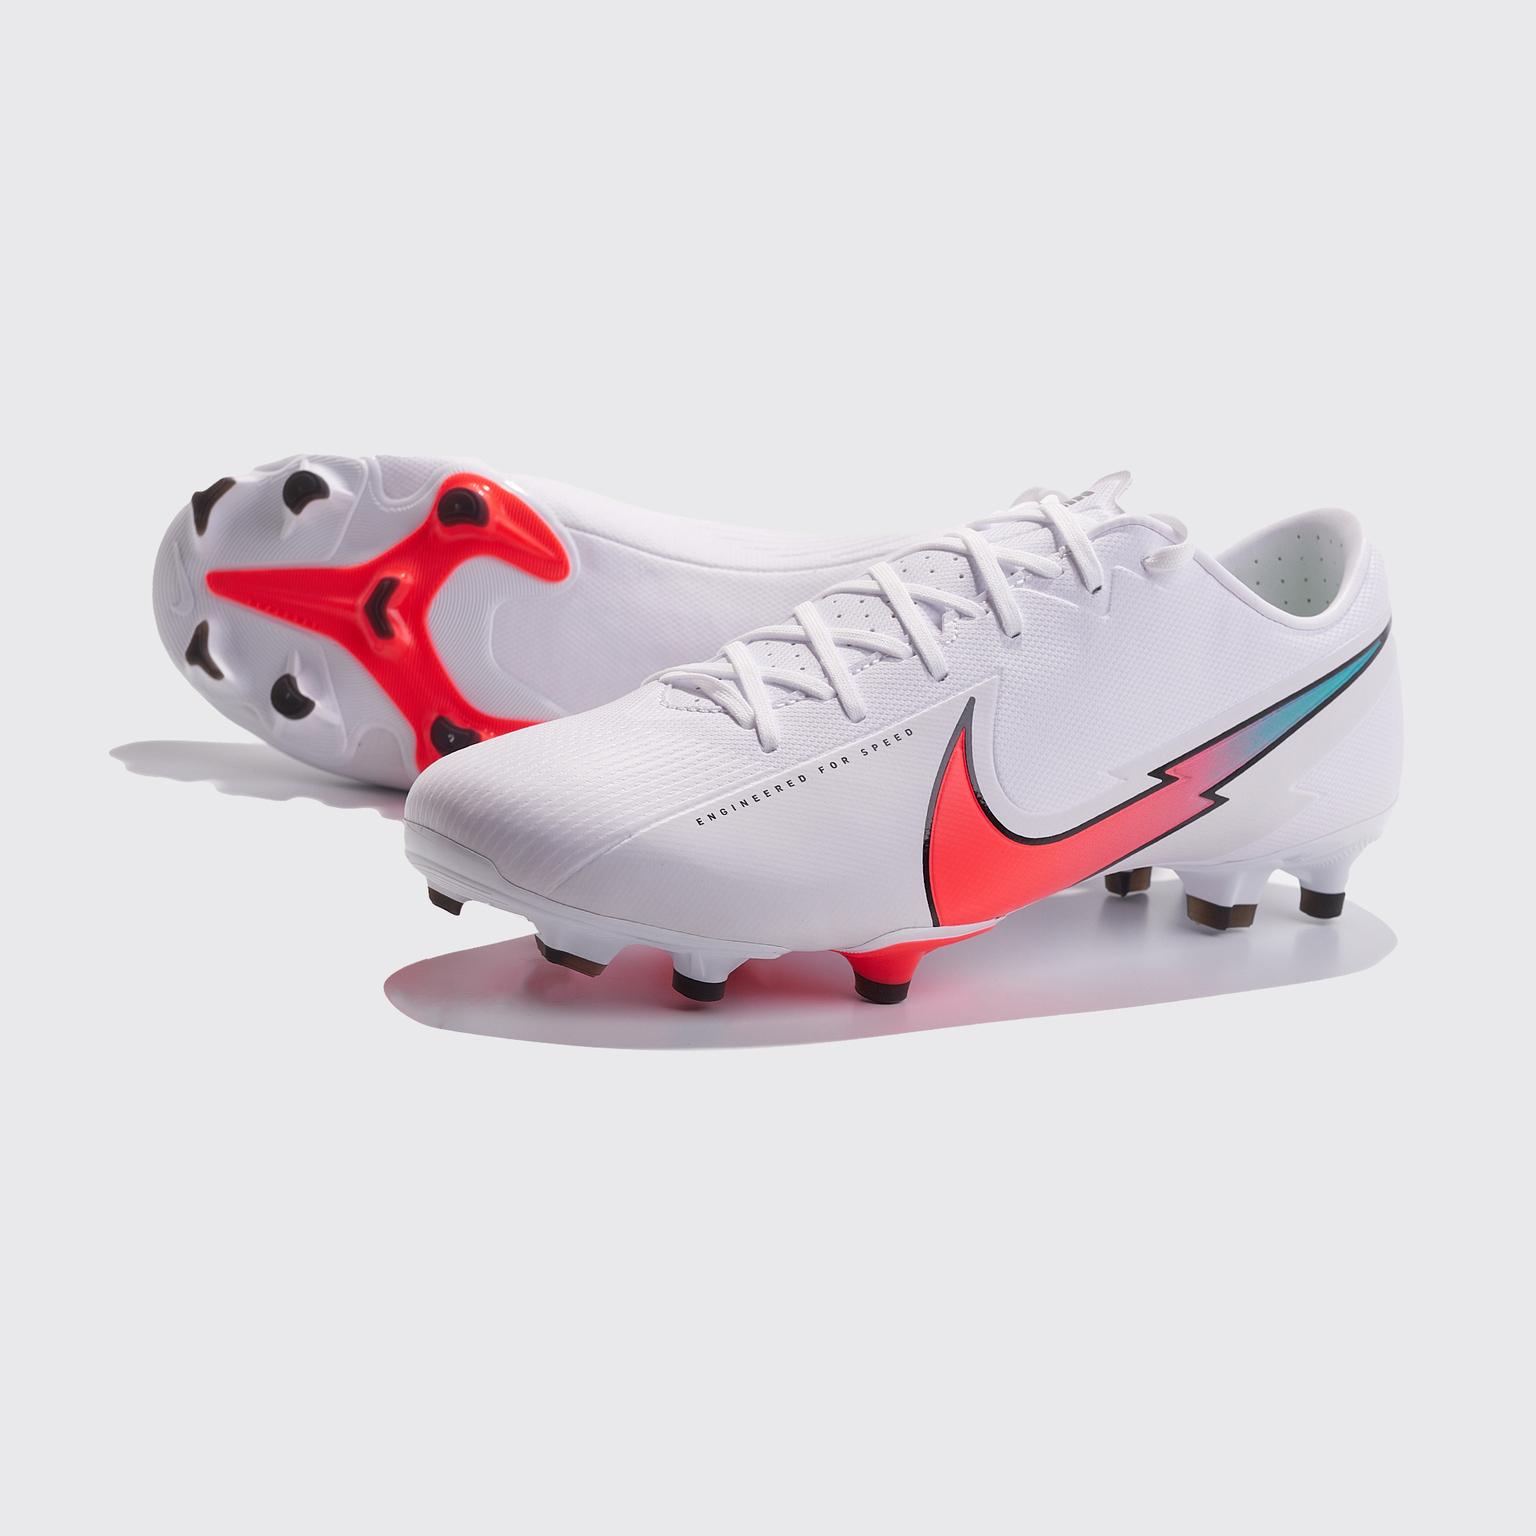 Бутсы Nike Vapor 13 Academy FG/MG AT5269-163 бутсы nike superfly 7 academy fg mg at7946 163